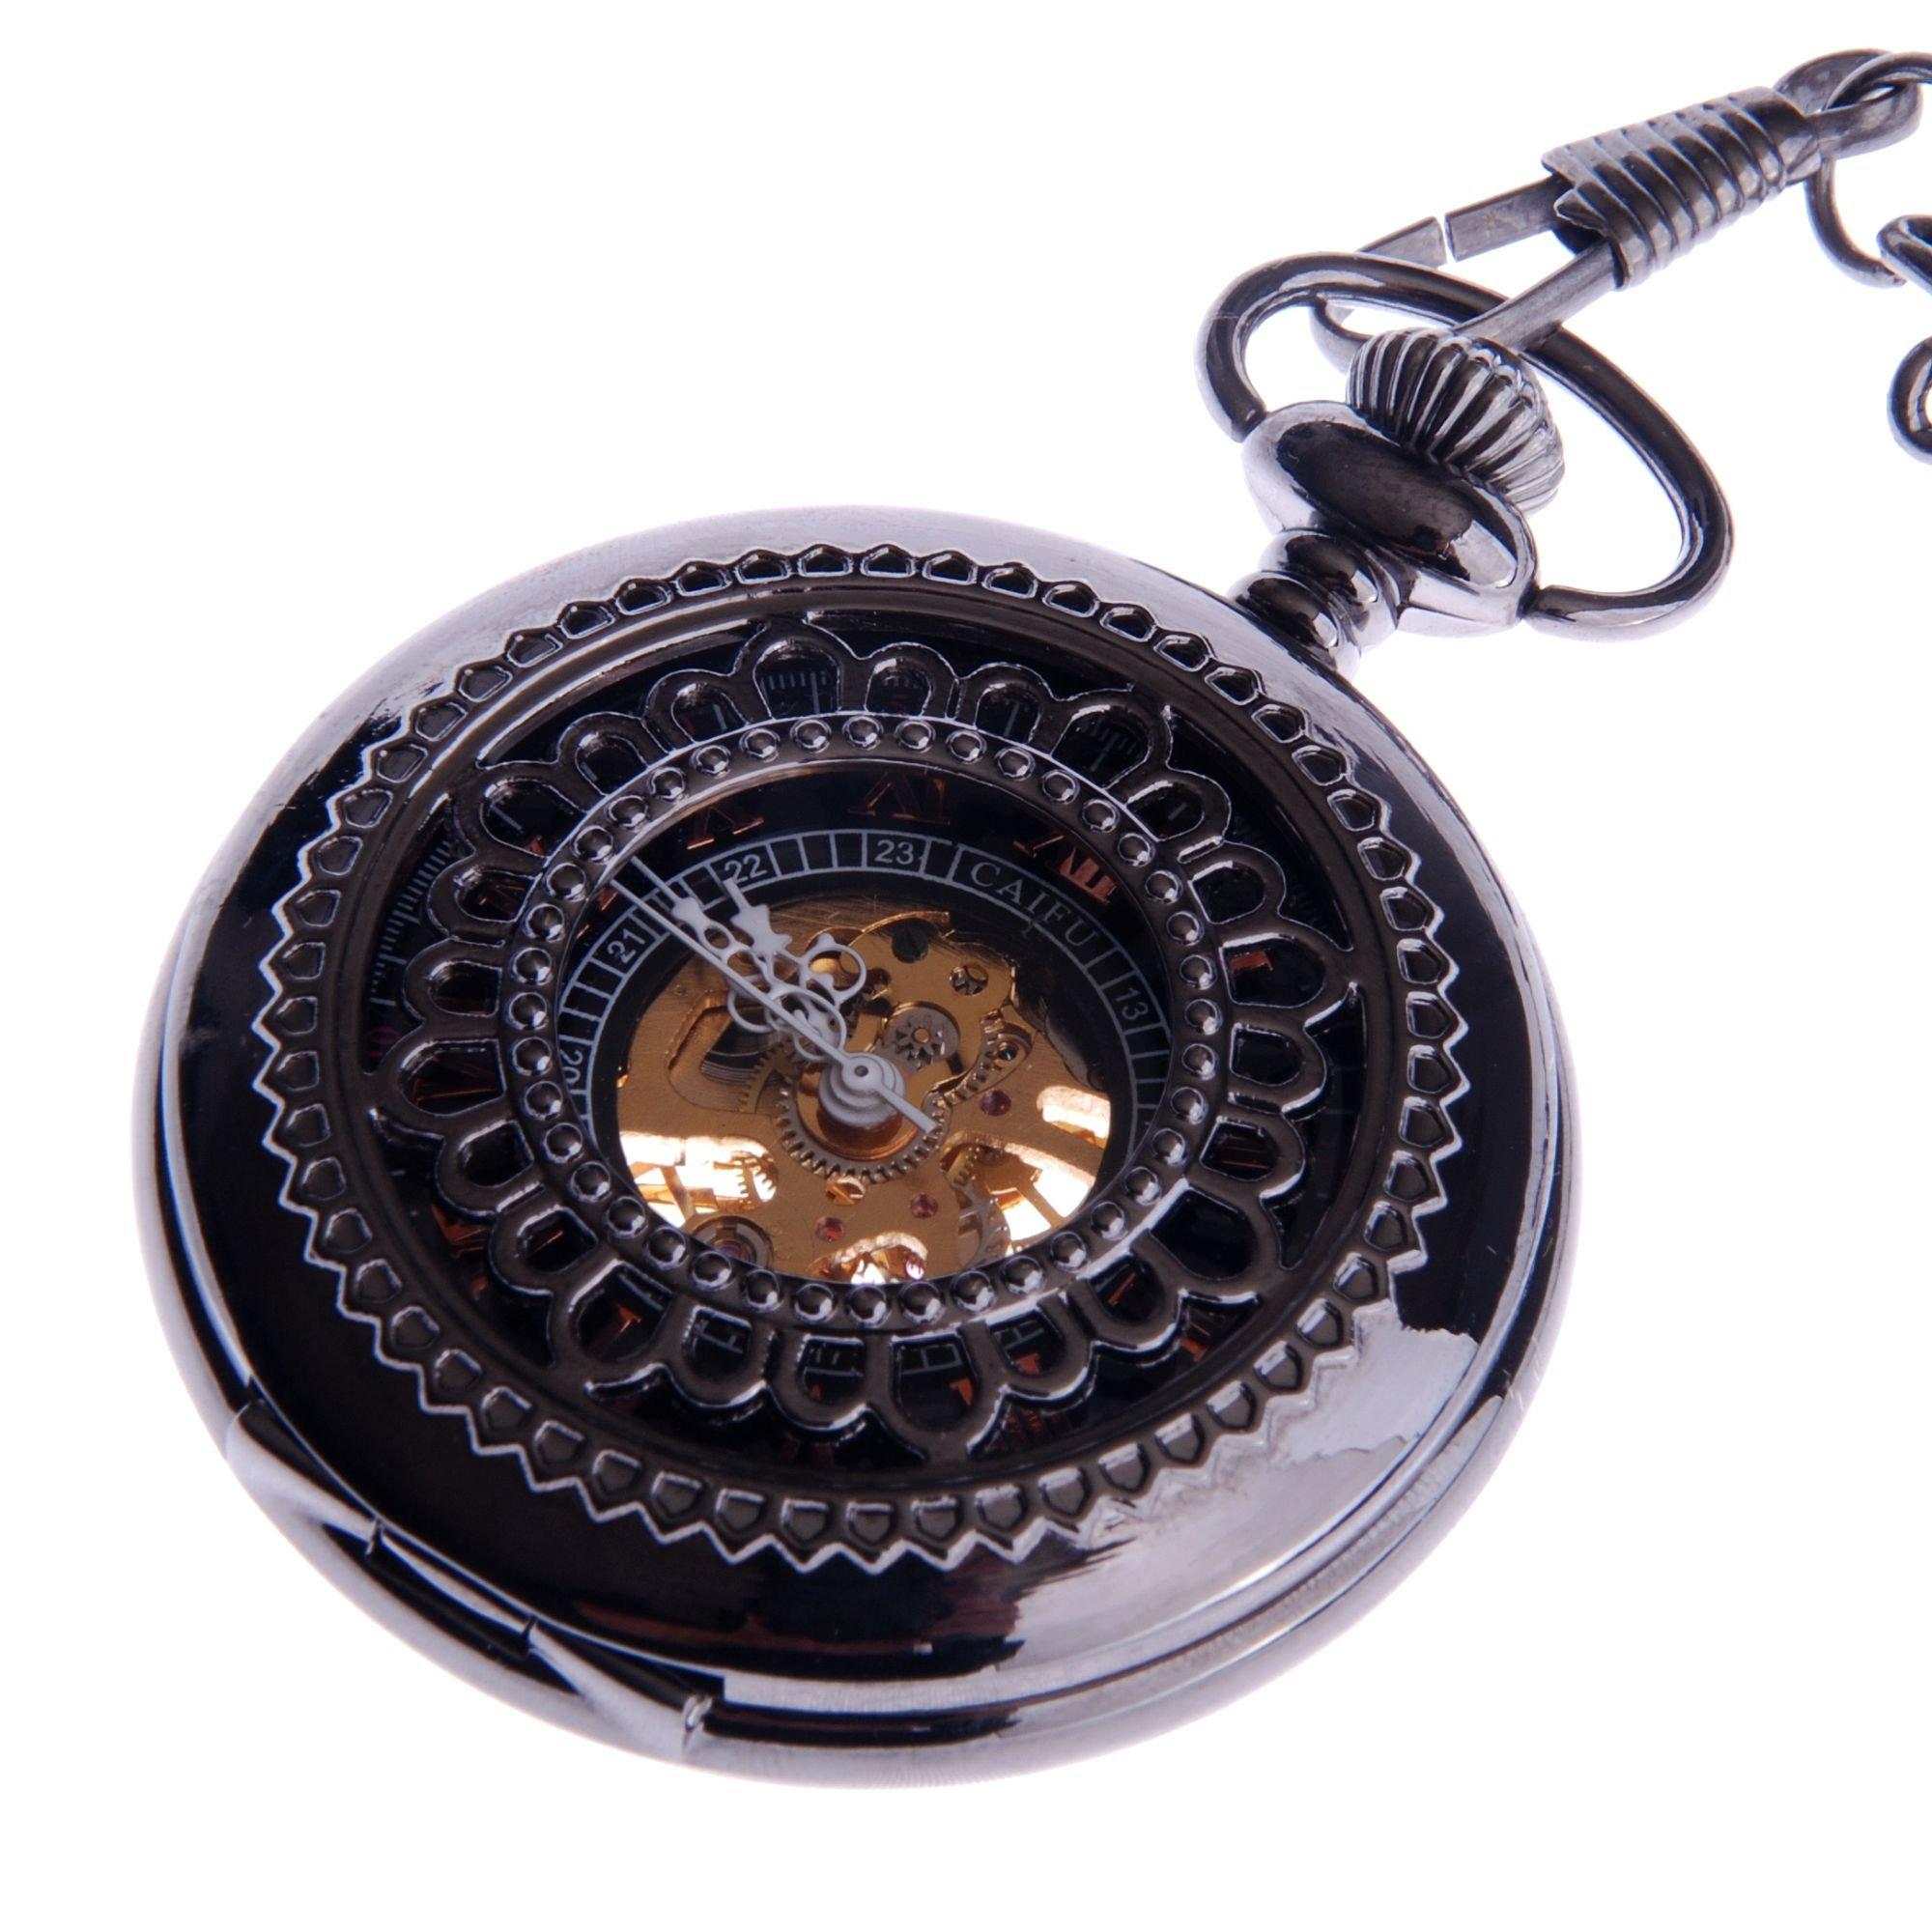 Skeleton Mechanical Pocket Watch Wind Up with Chain Mens Steampunk Pocketwatch Reloj de Bolsillo by ShoppeWatch- PW33